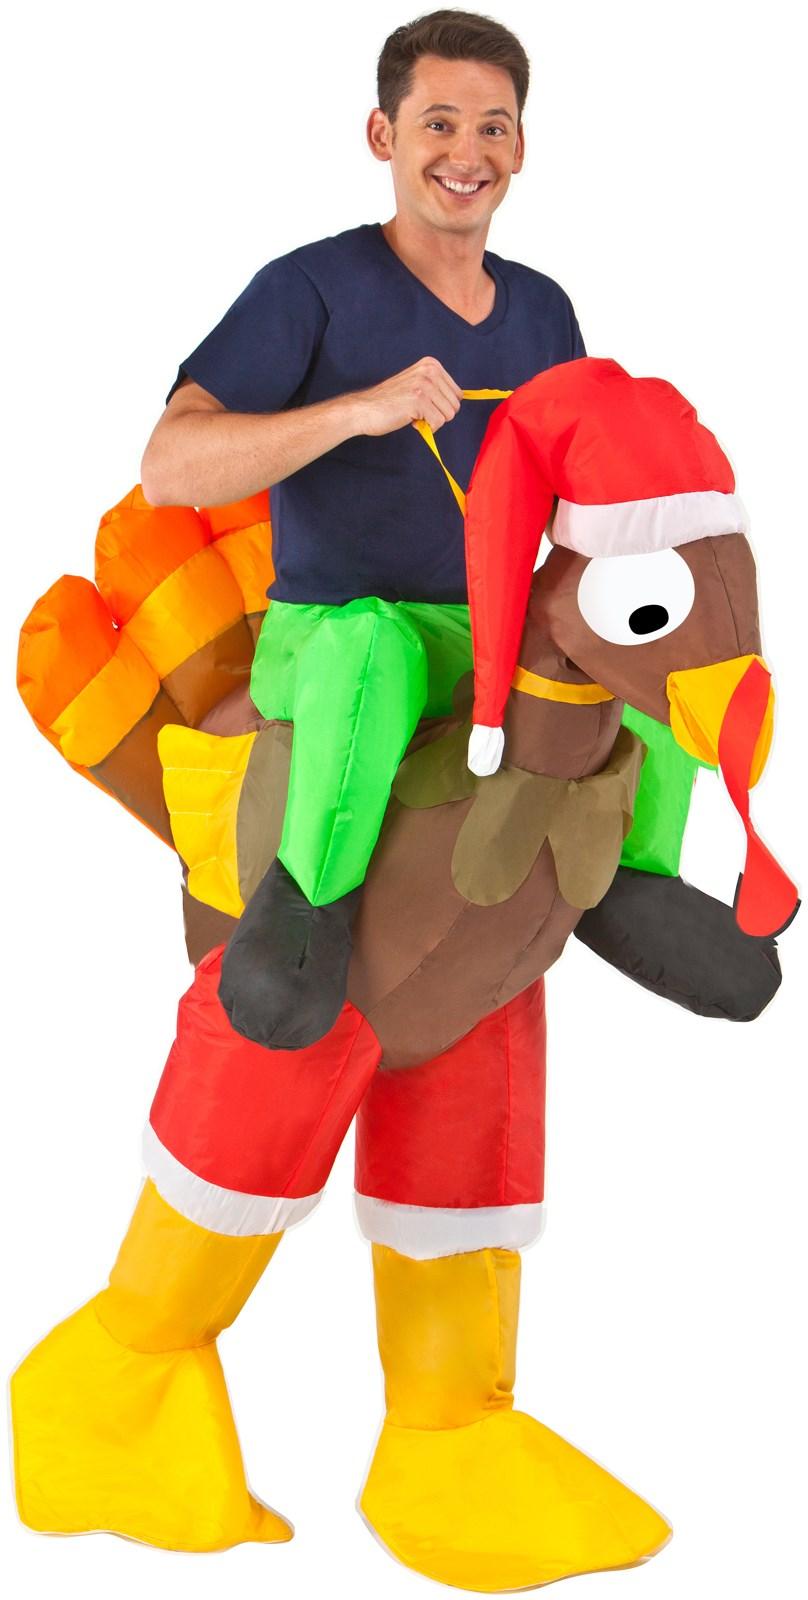 Inflatable Rider - Adult Turkey Costume | BuyCostumes.com